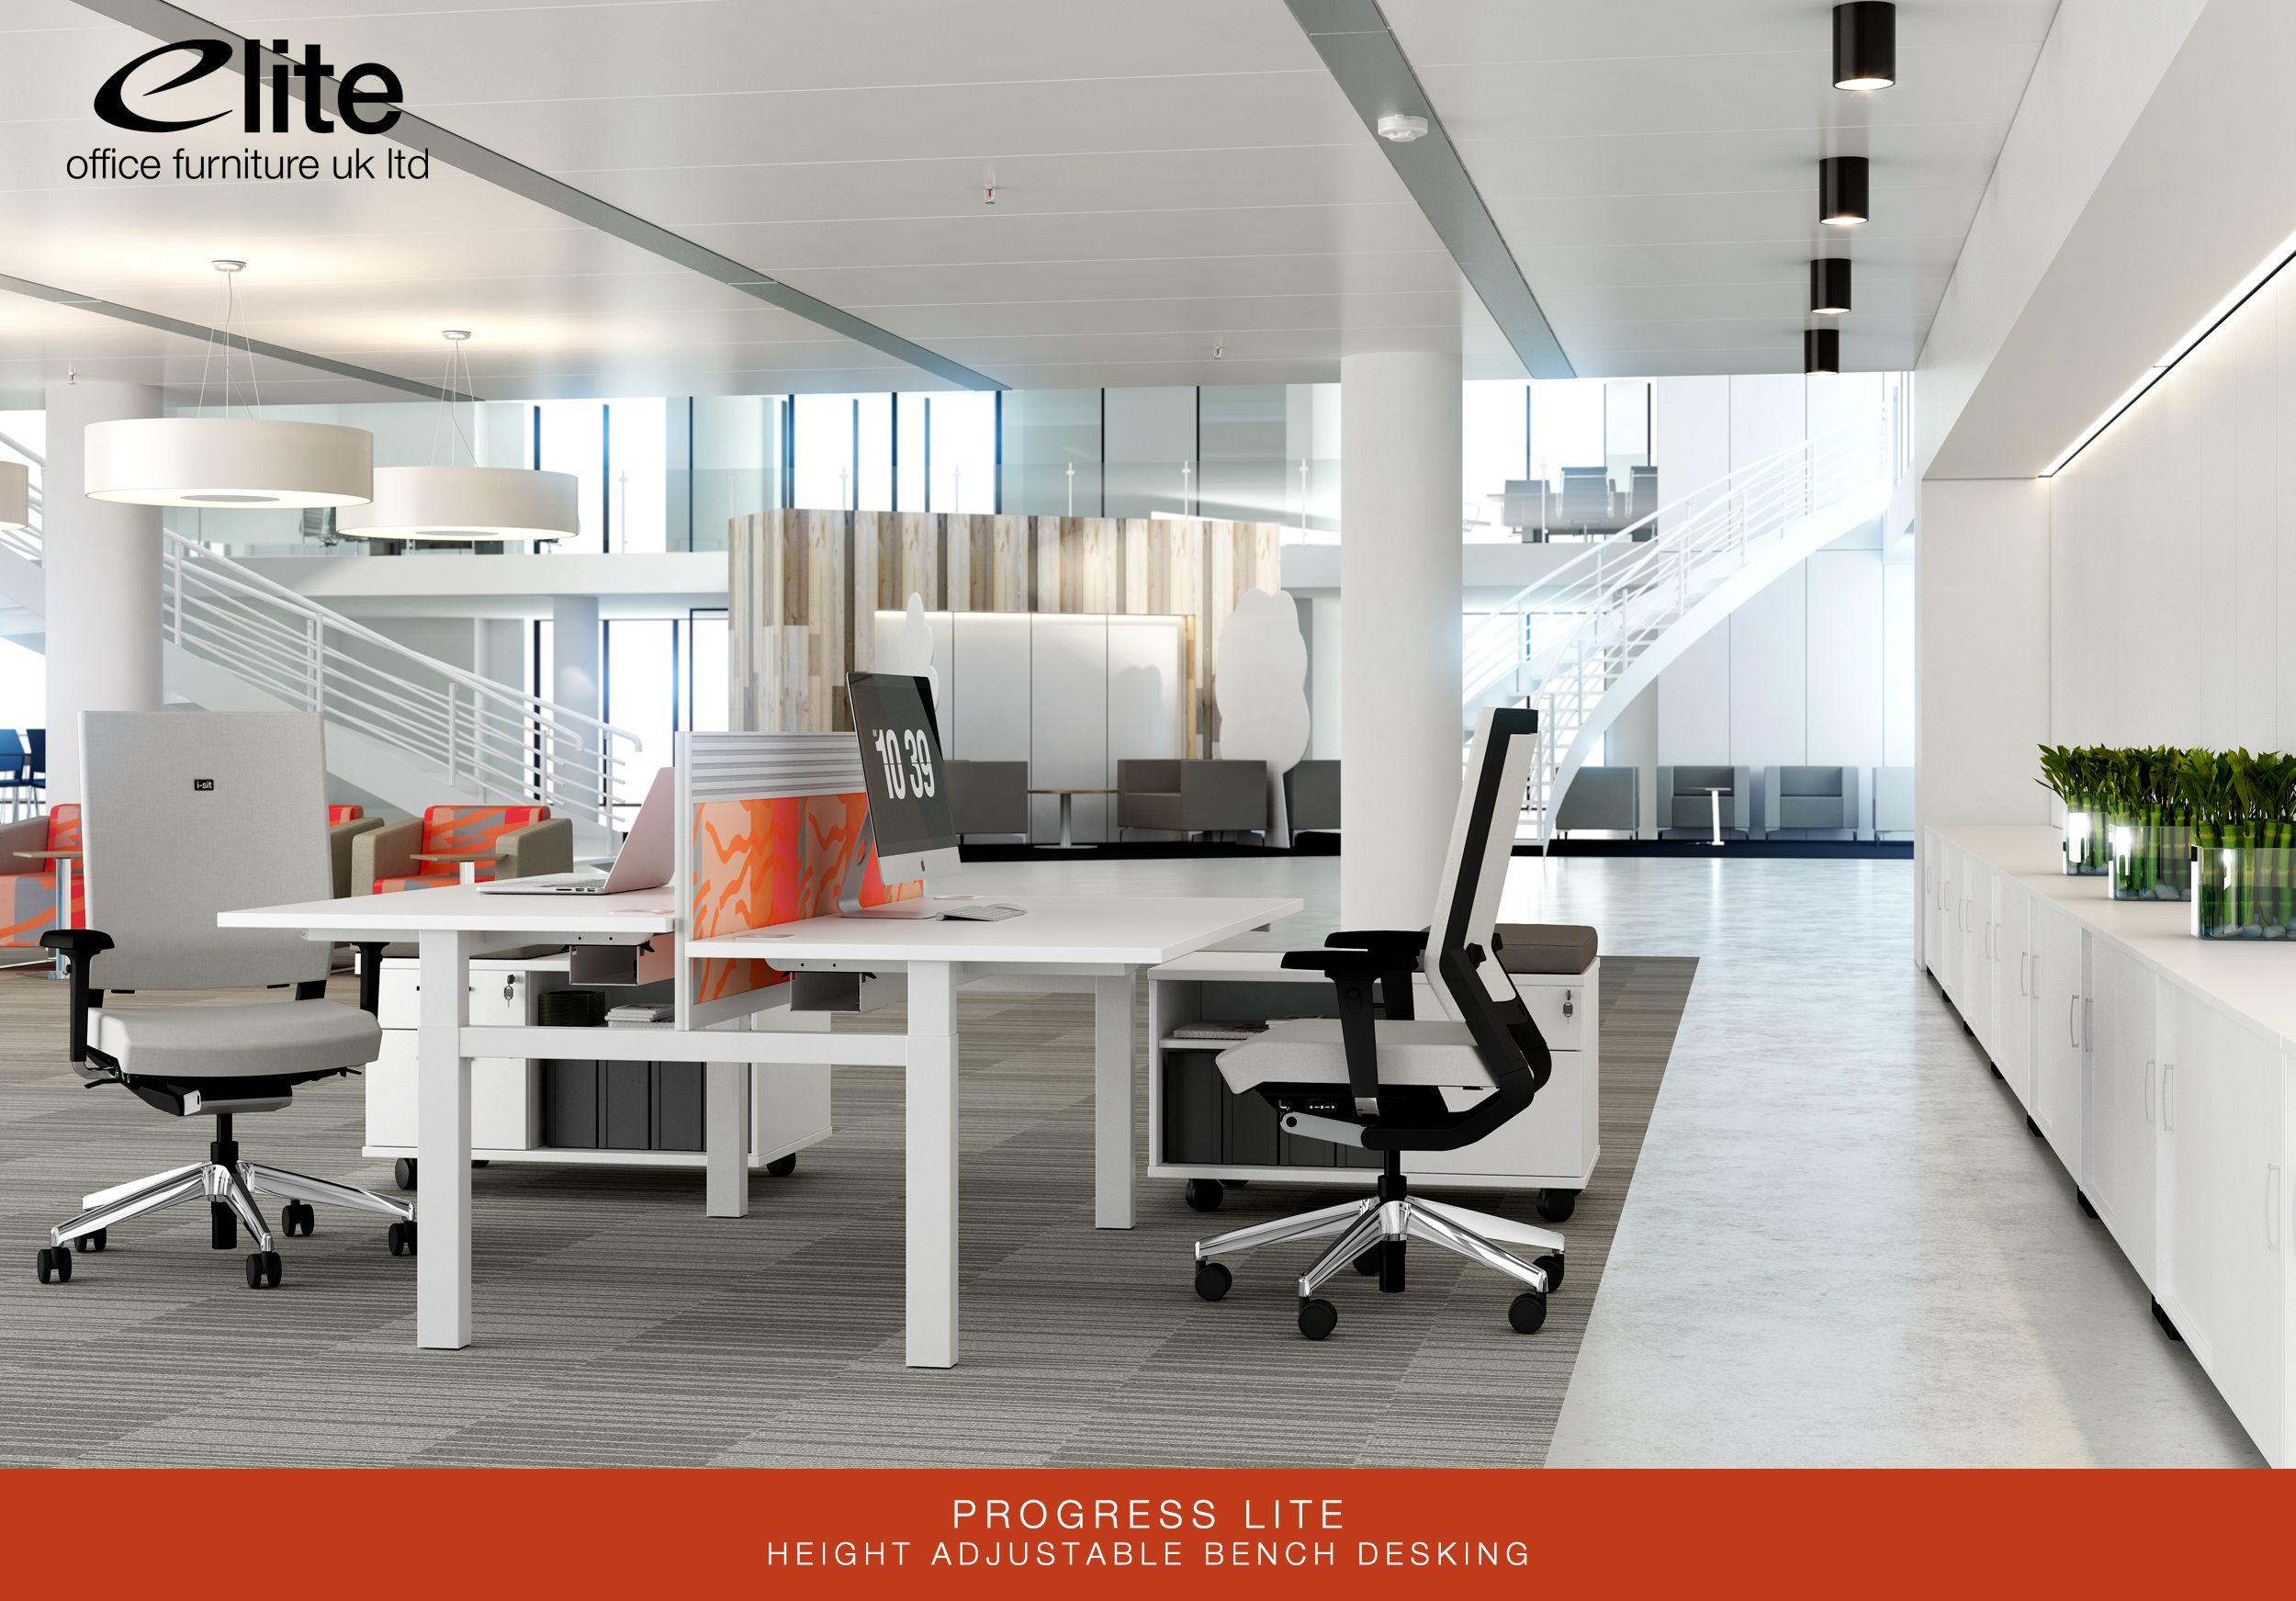 Progress Lite Height Adjustable SitSit Bench Desking